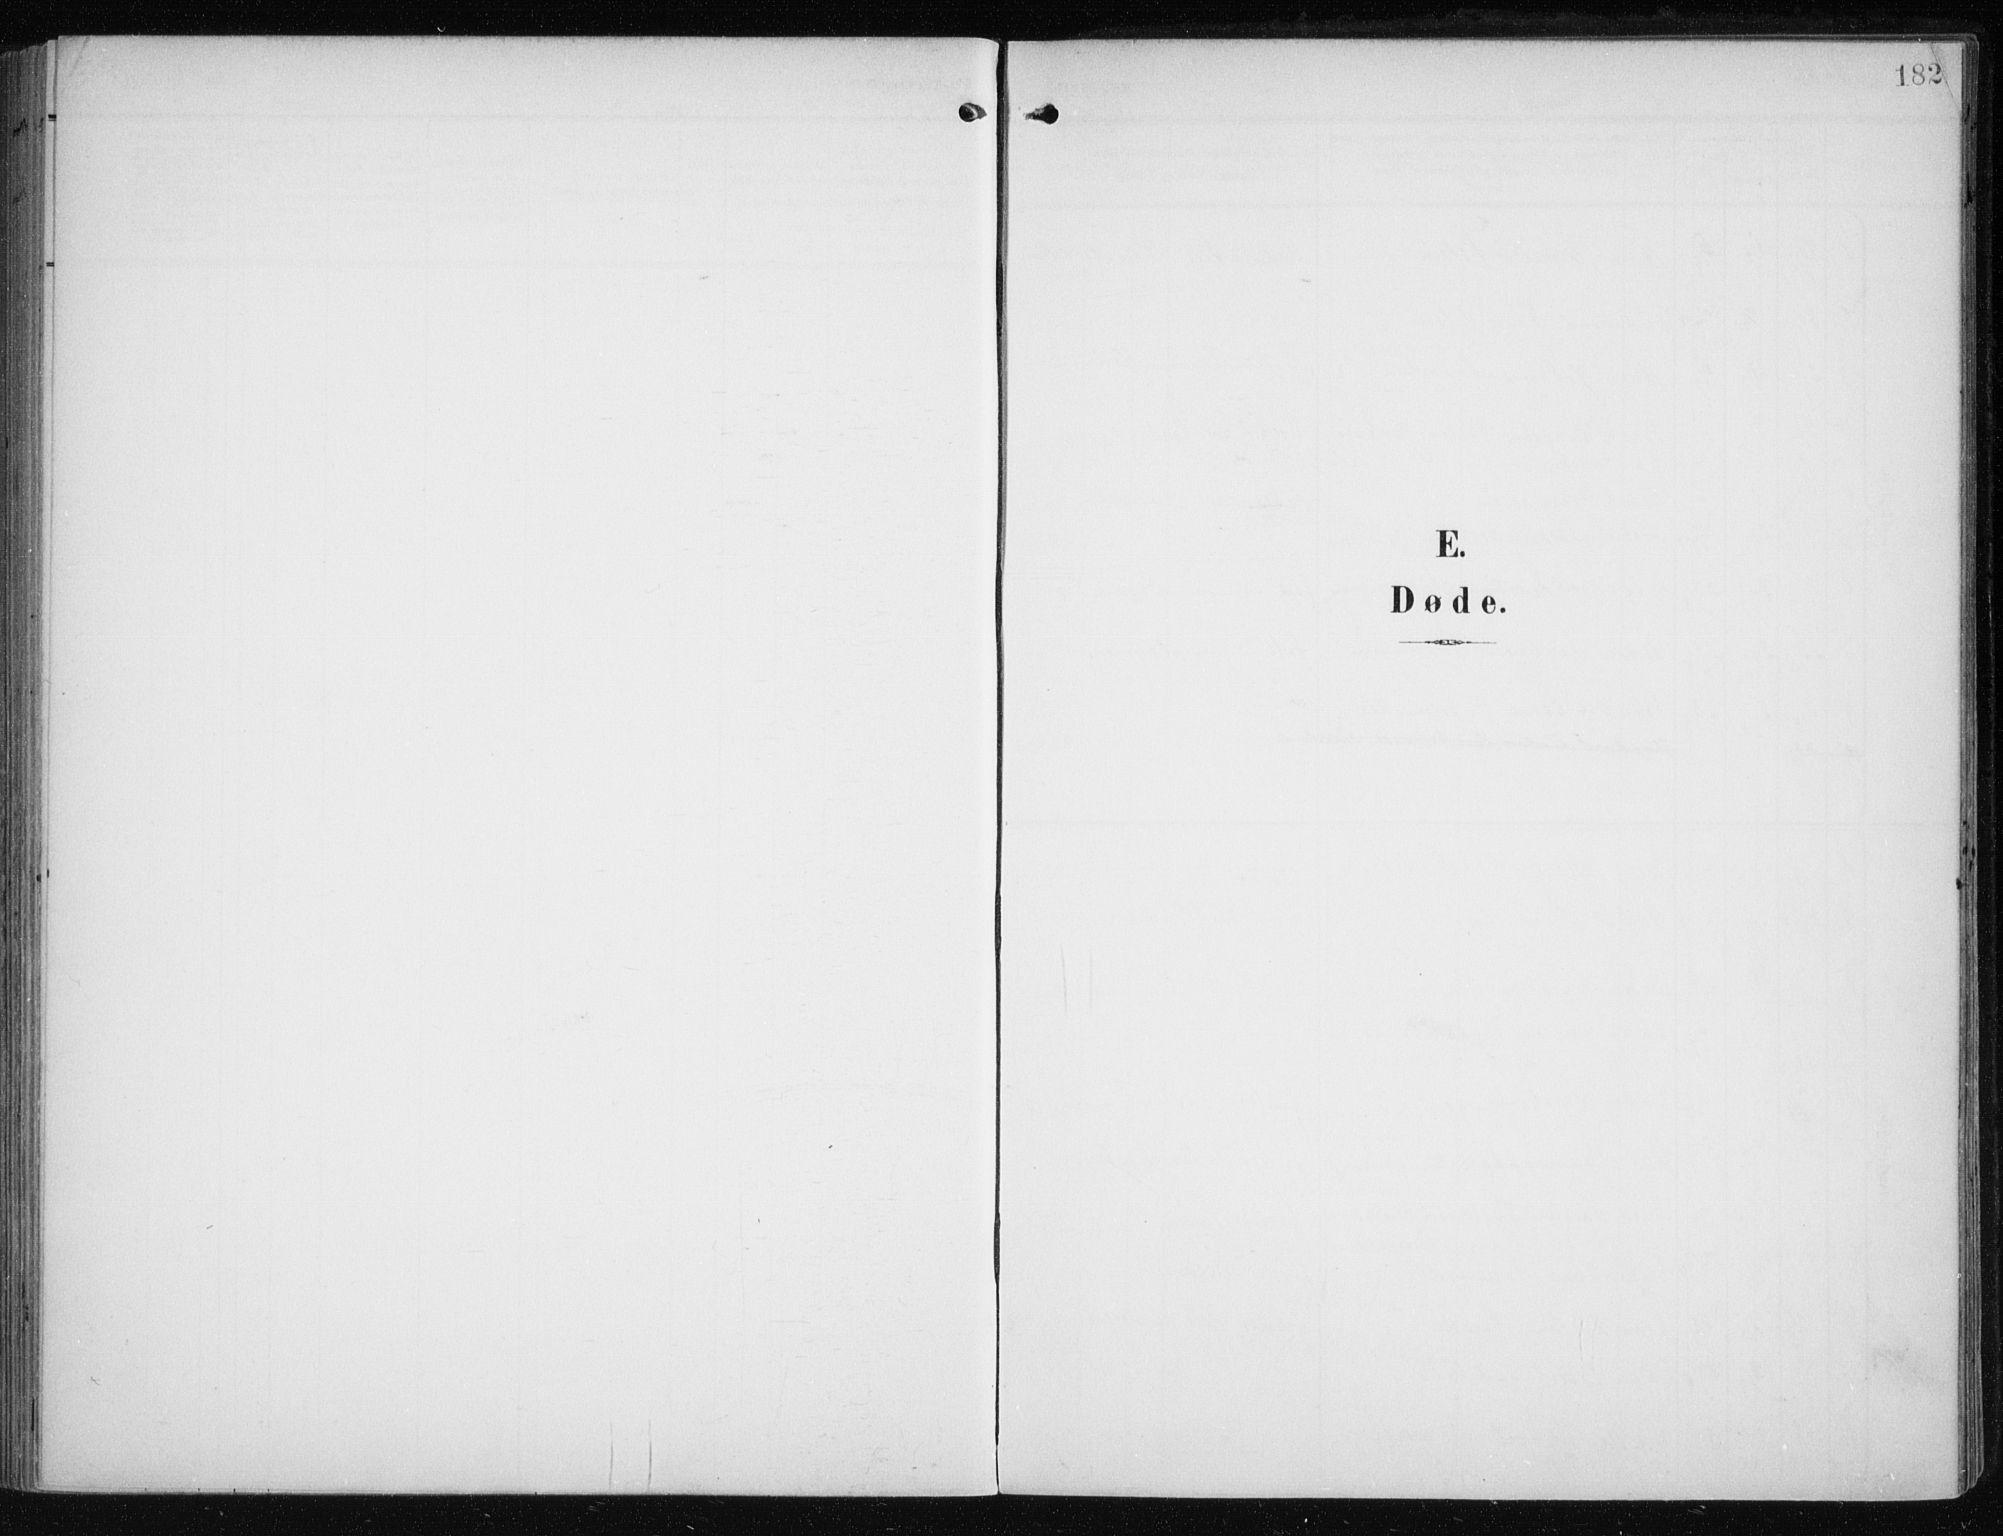 SATØ, Måsøy sokneprestkontor, H/Ha/L0009kirke: Ministerialbok nr. 9, 1903-1914, s. 182